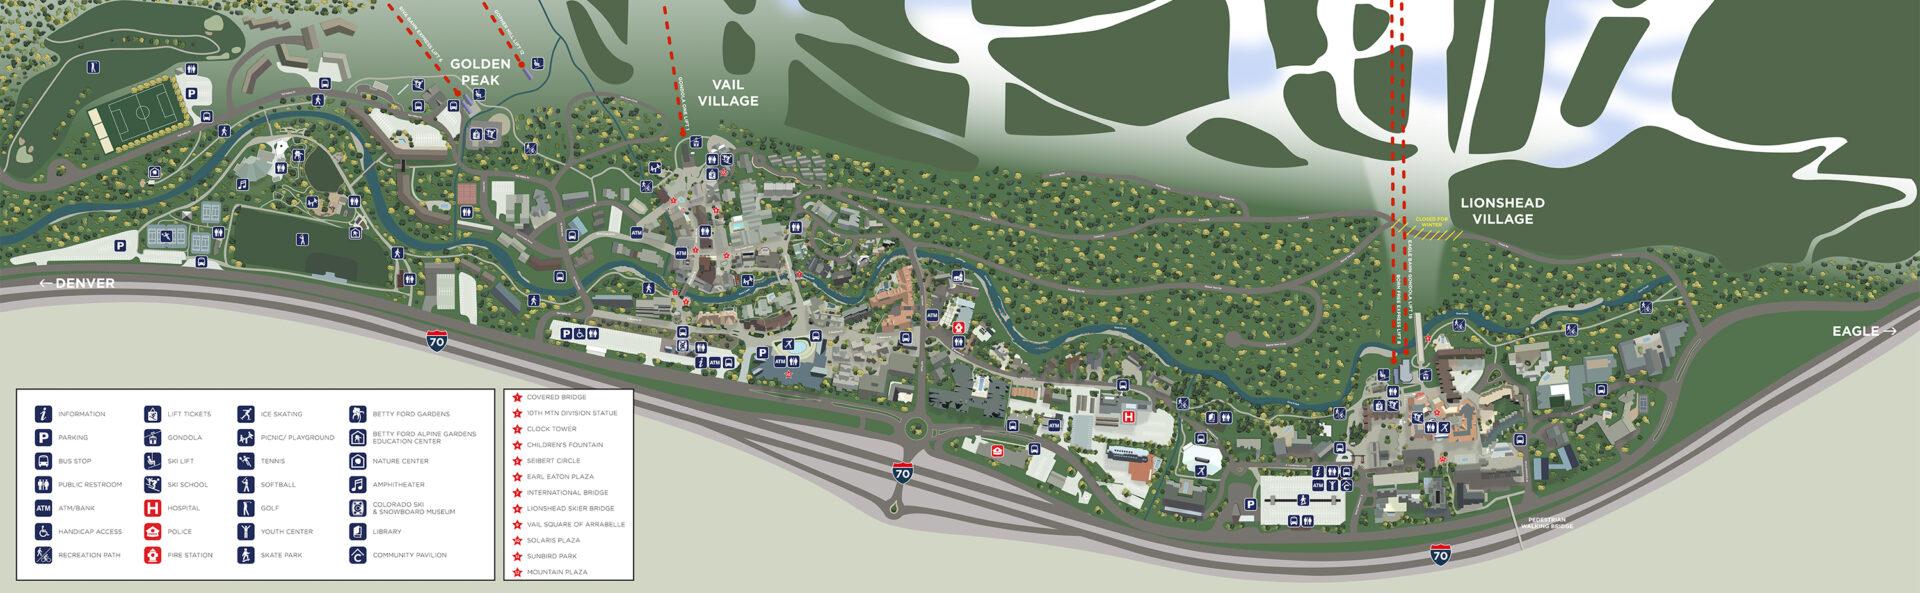 Town of Vail slideshow header